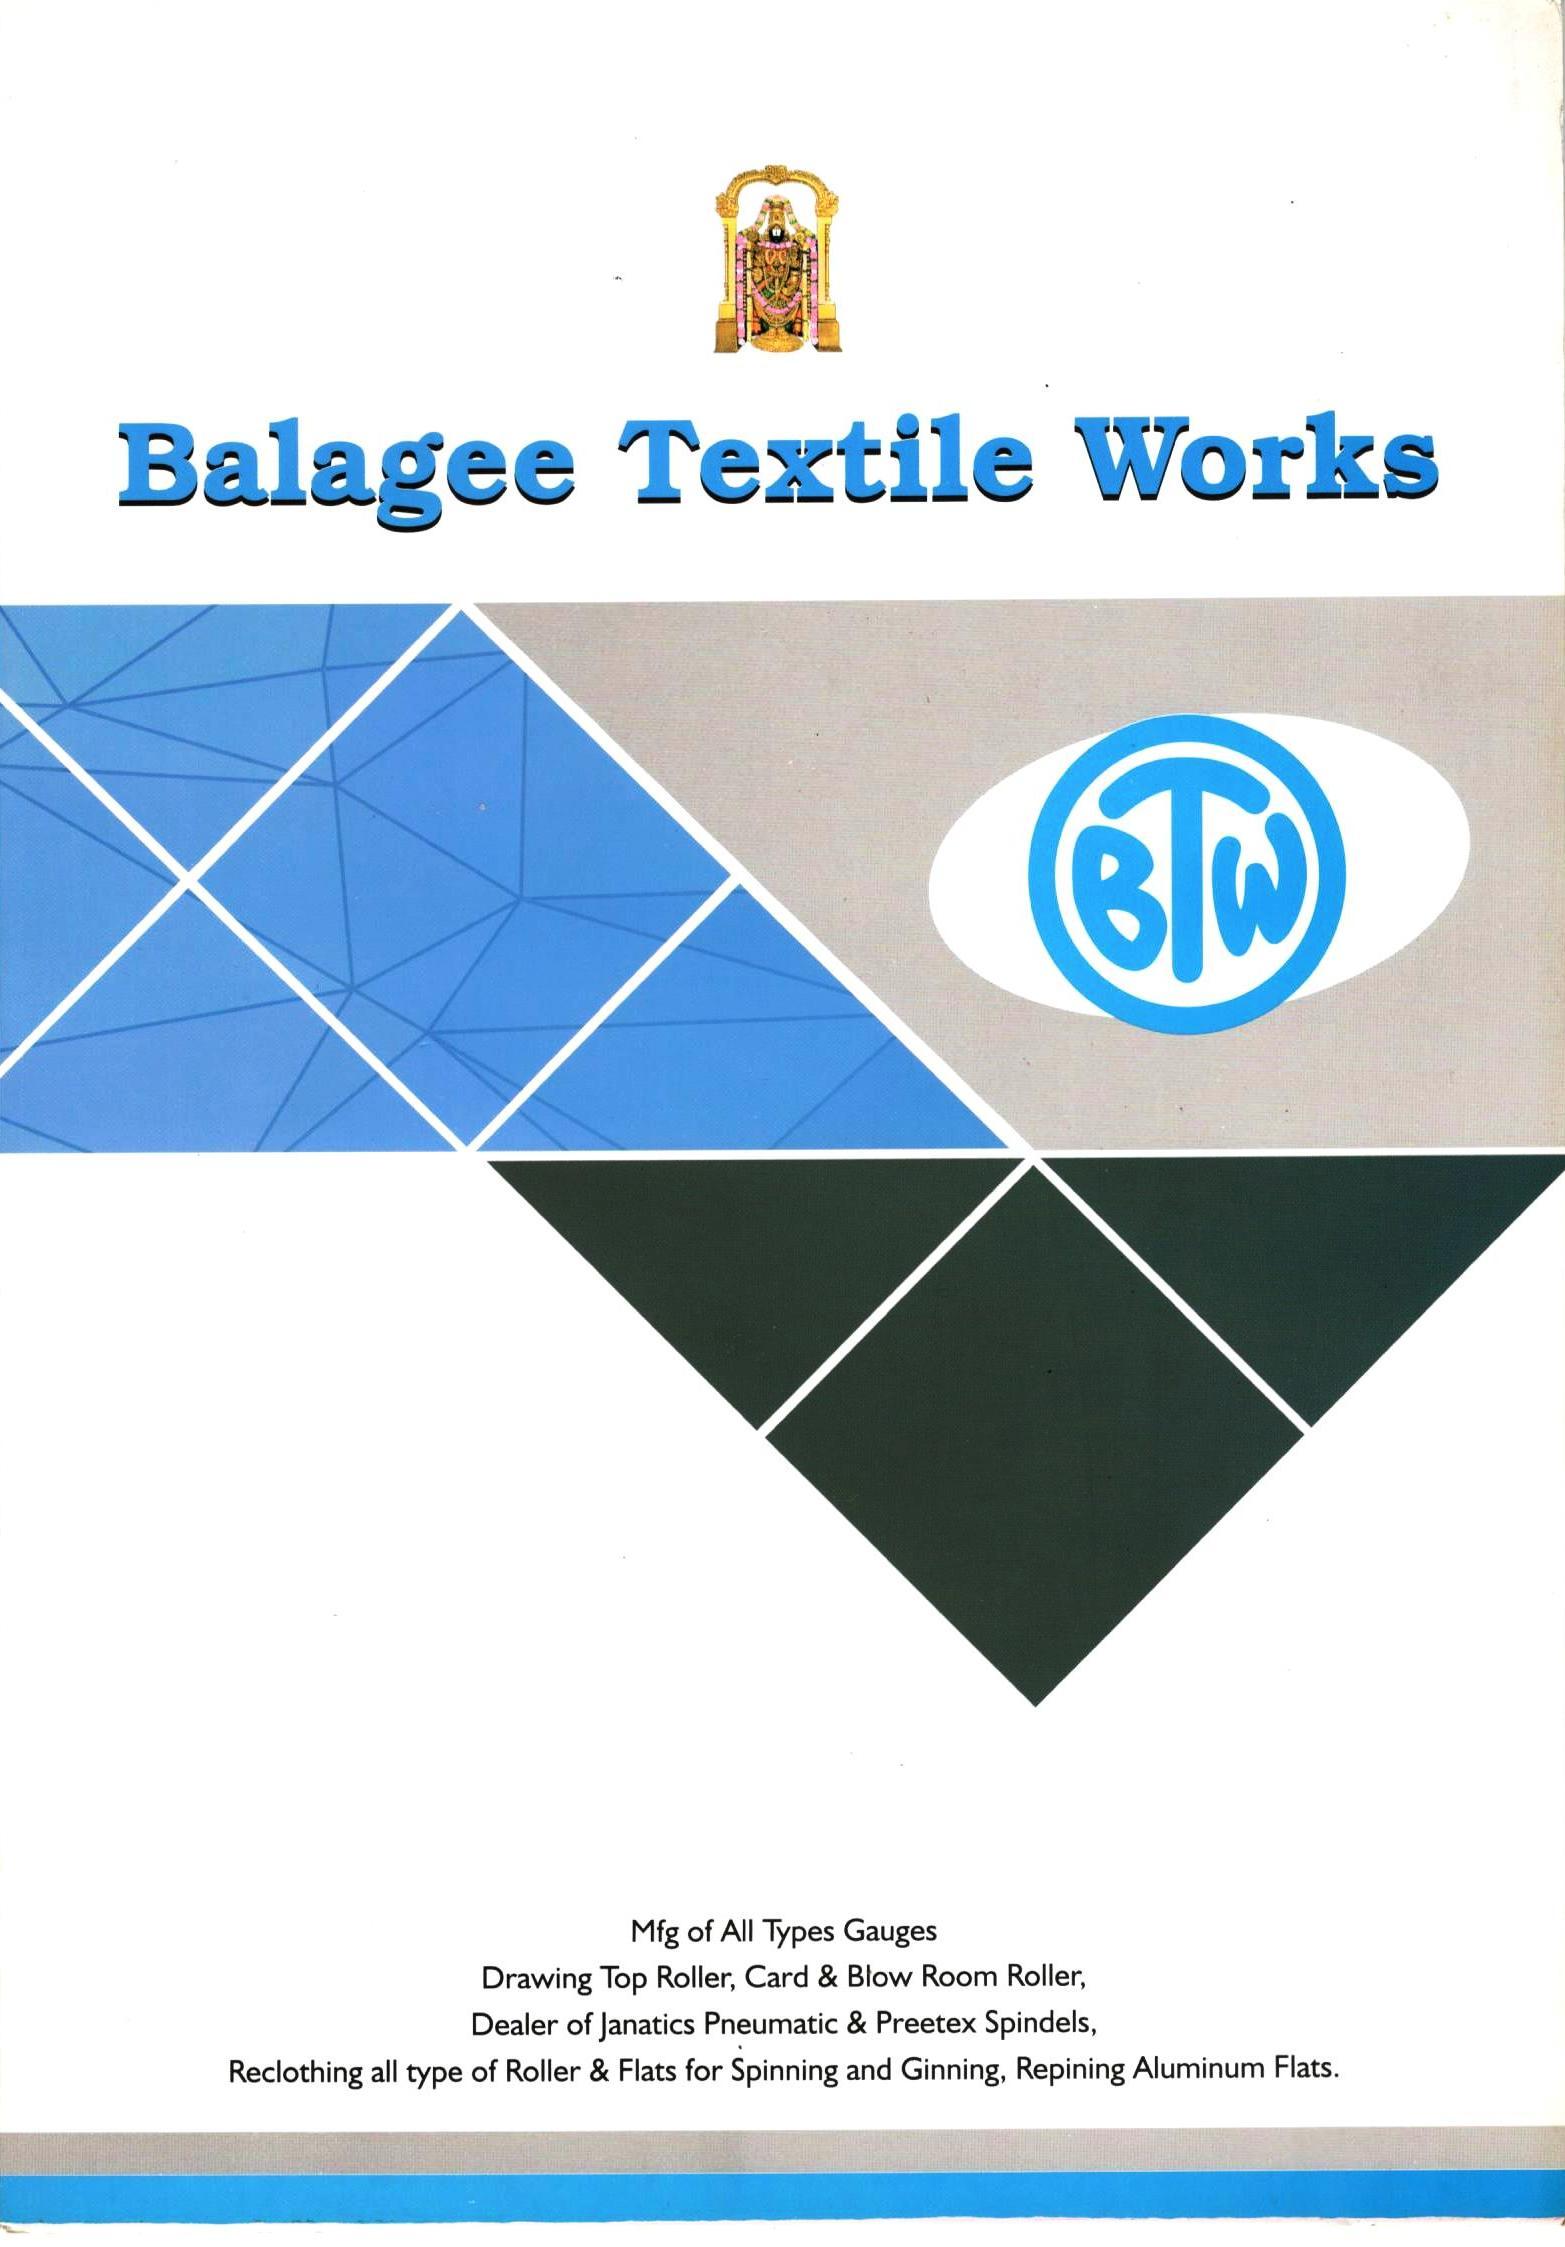 BALAGEE TEXTILE WORKS